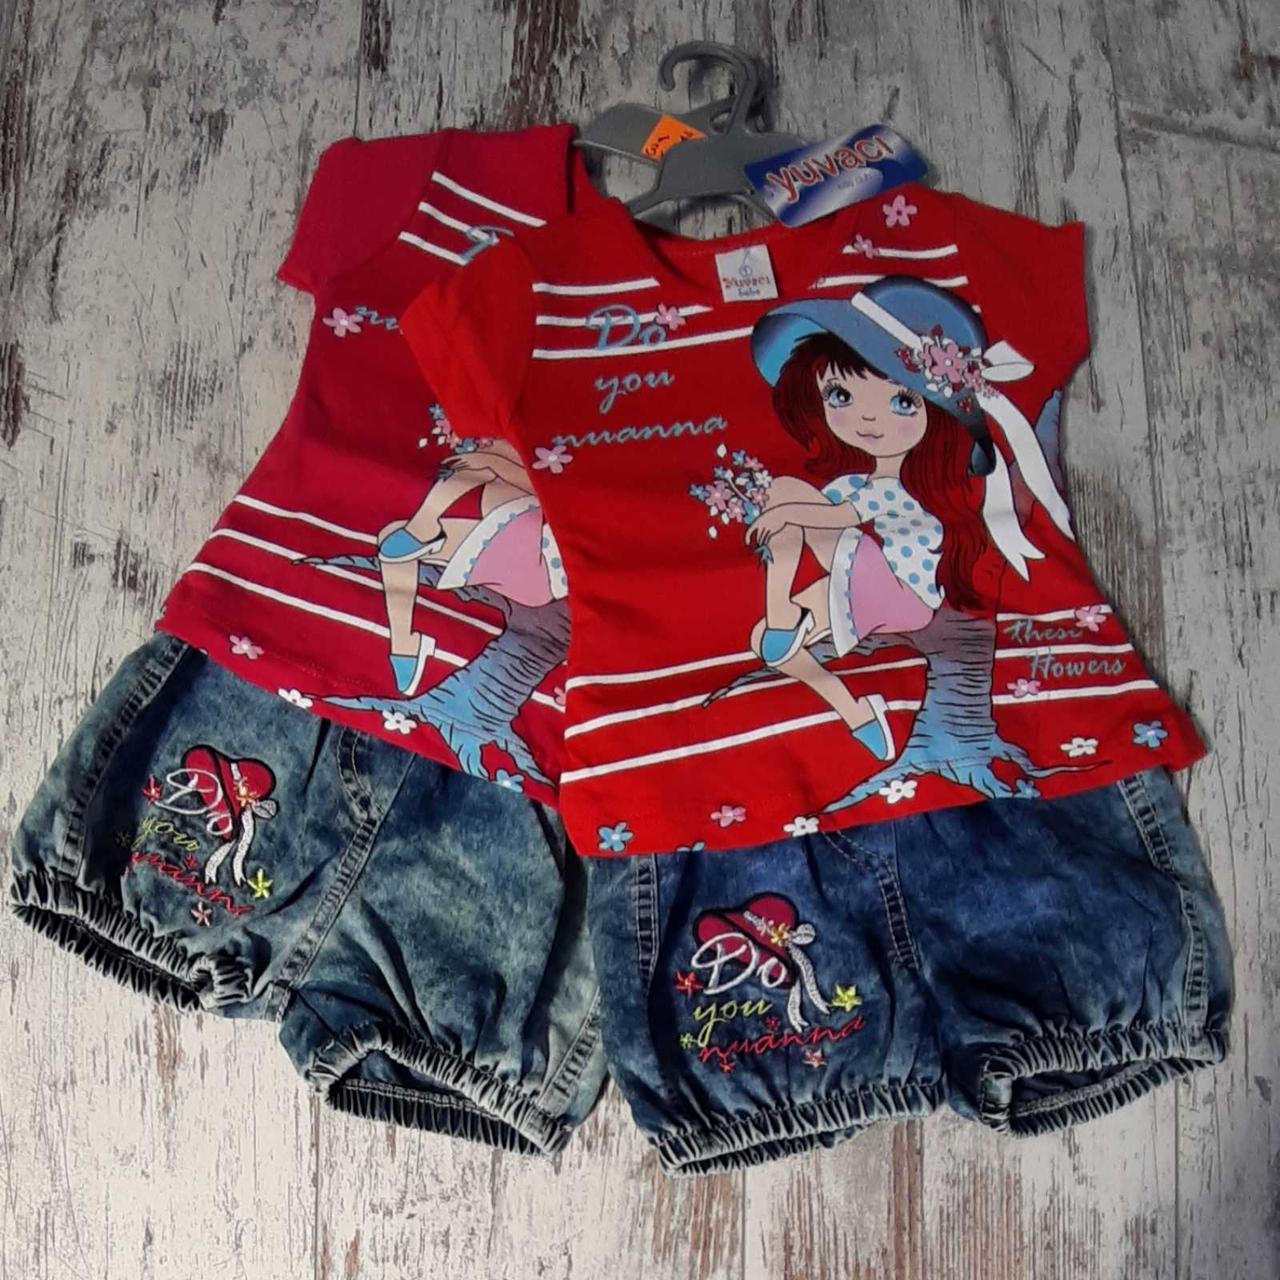 Одежда звезда интернет магазин enchantimals gjx43